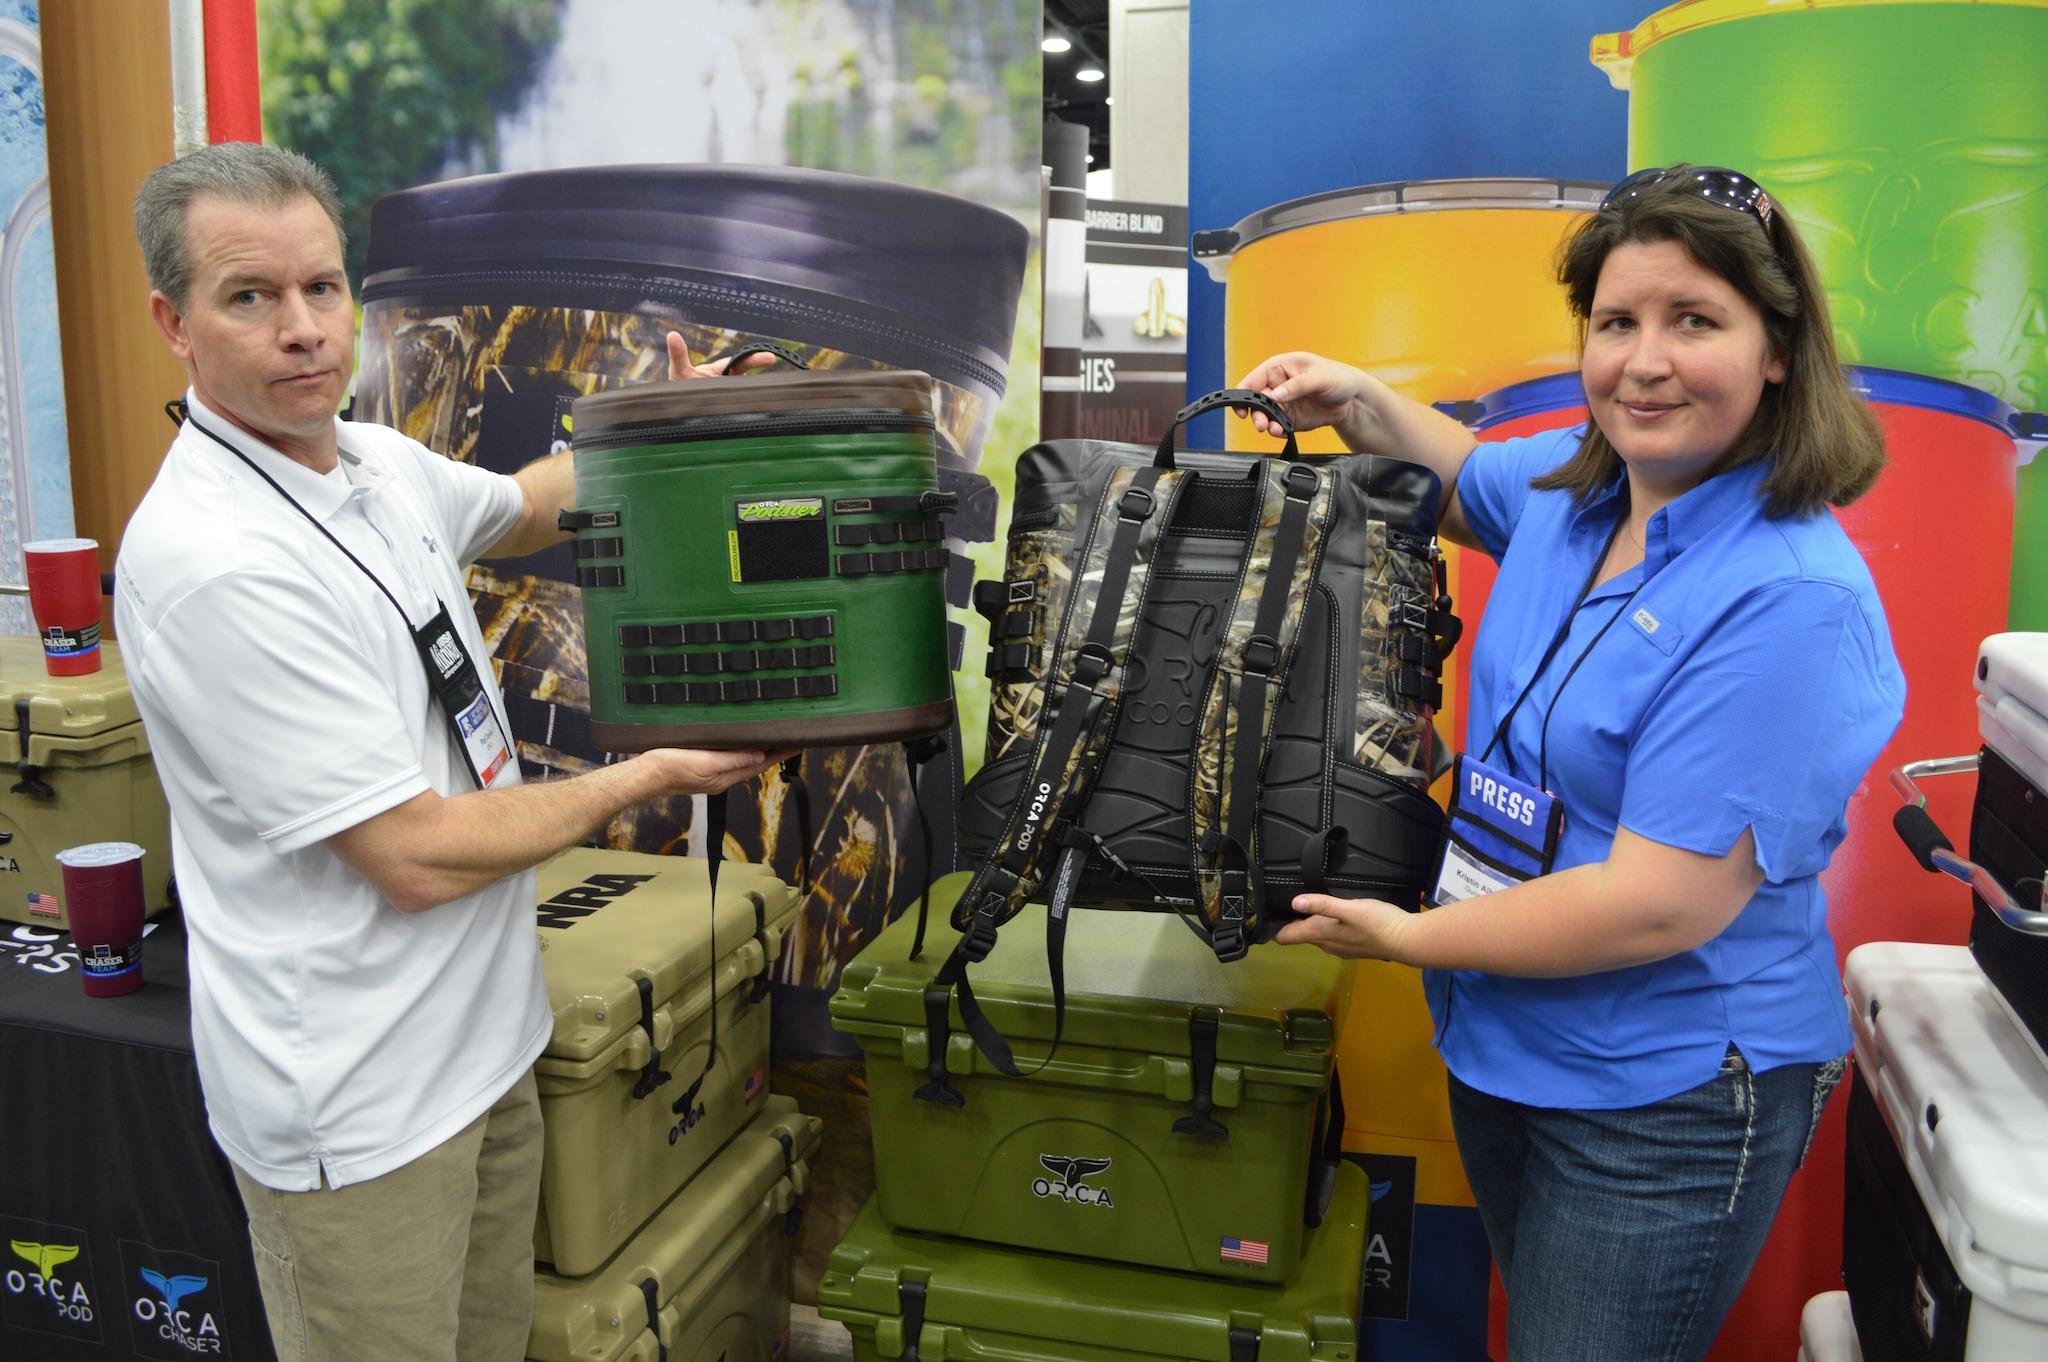 Orca Pod backpack coolers (Photo: Kristin Alberts)